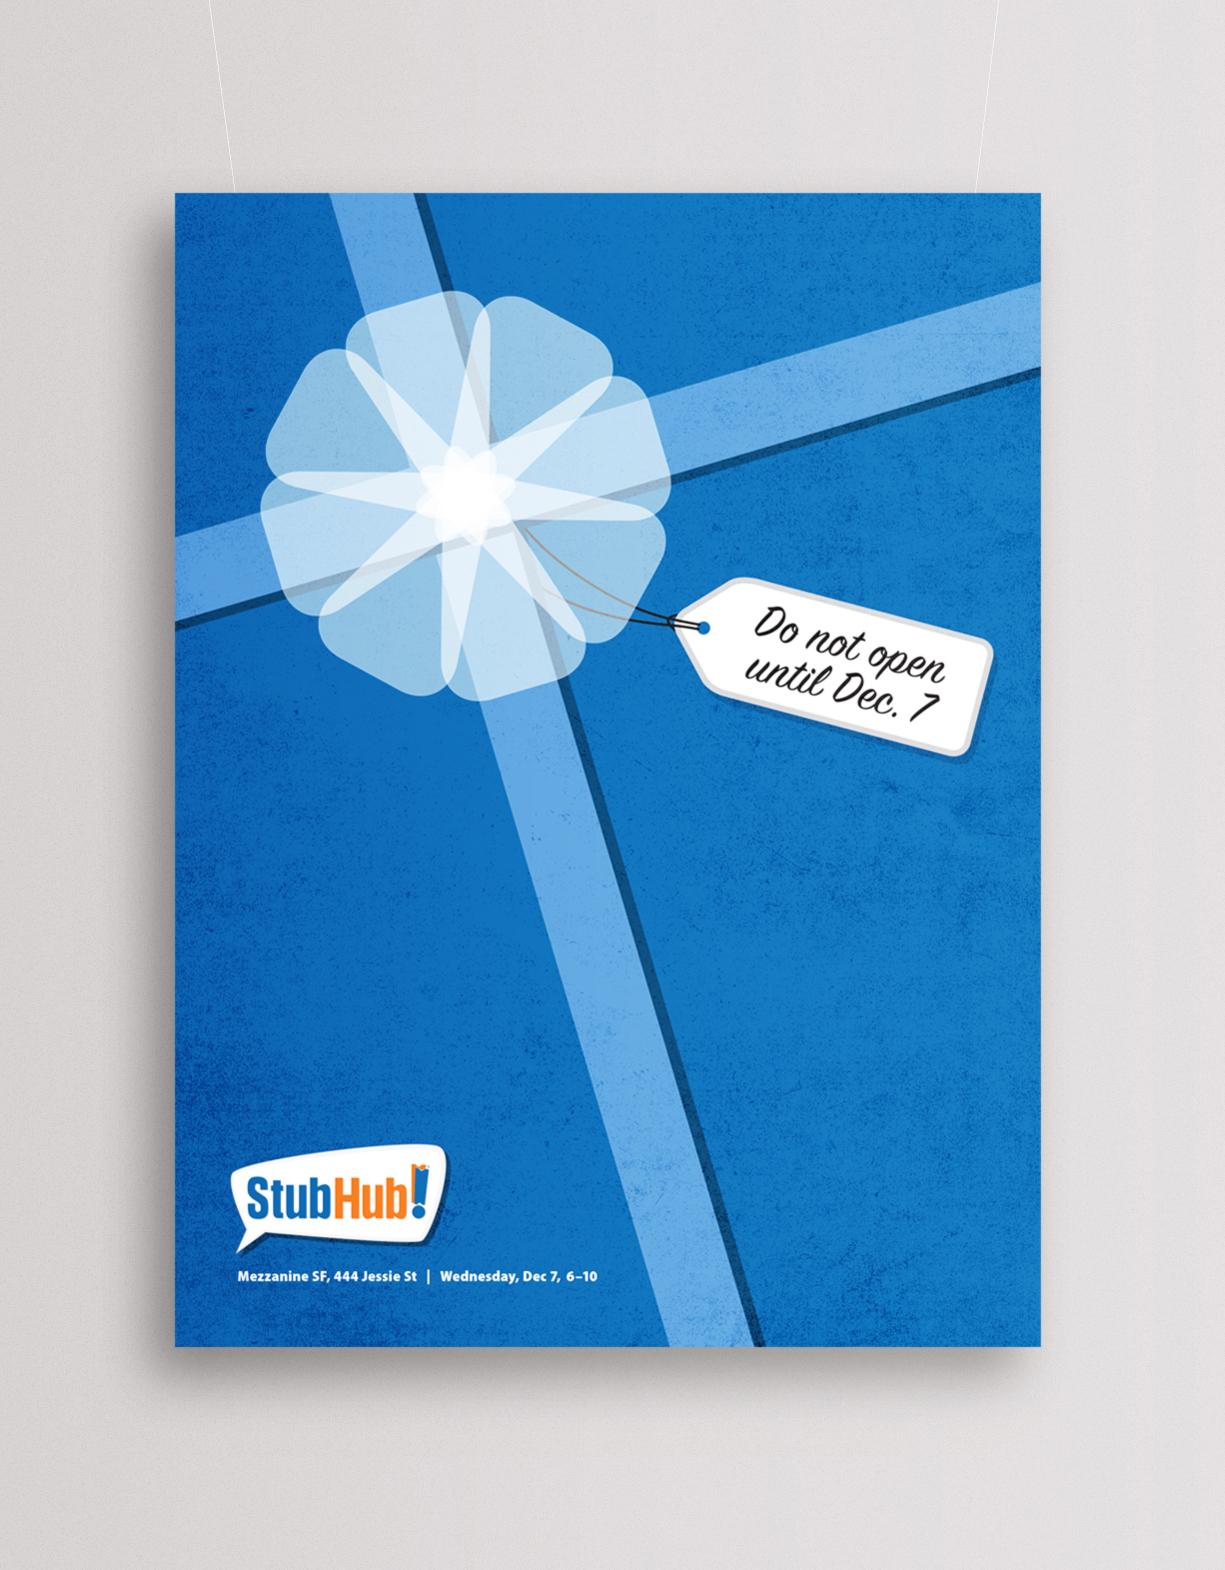 stubhub_Holiday-2011_Poster.jpg